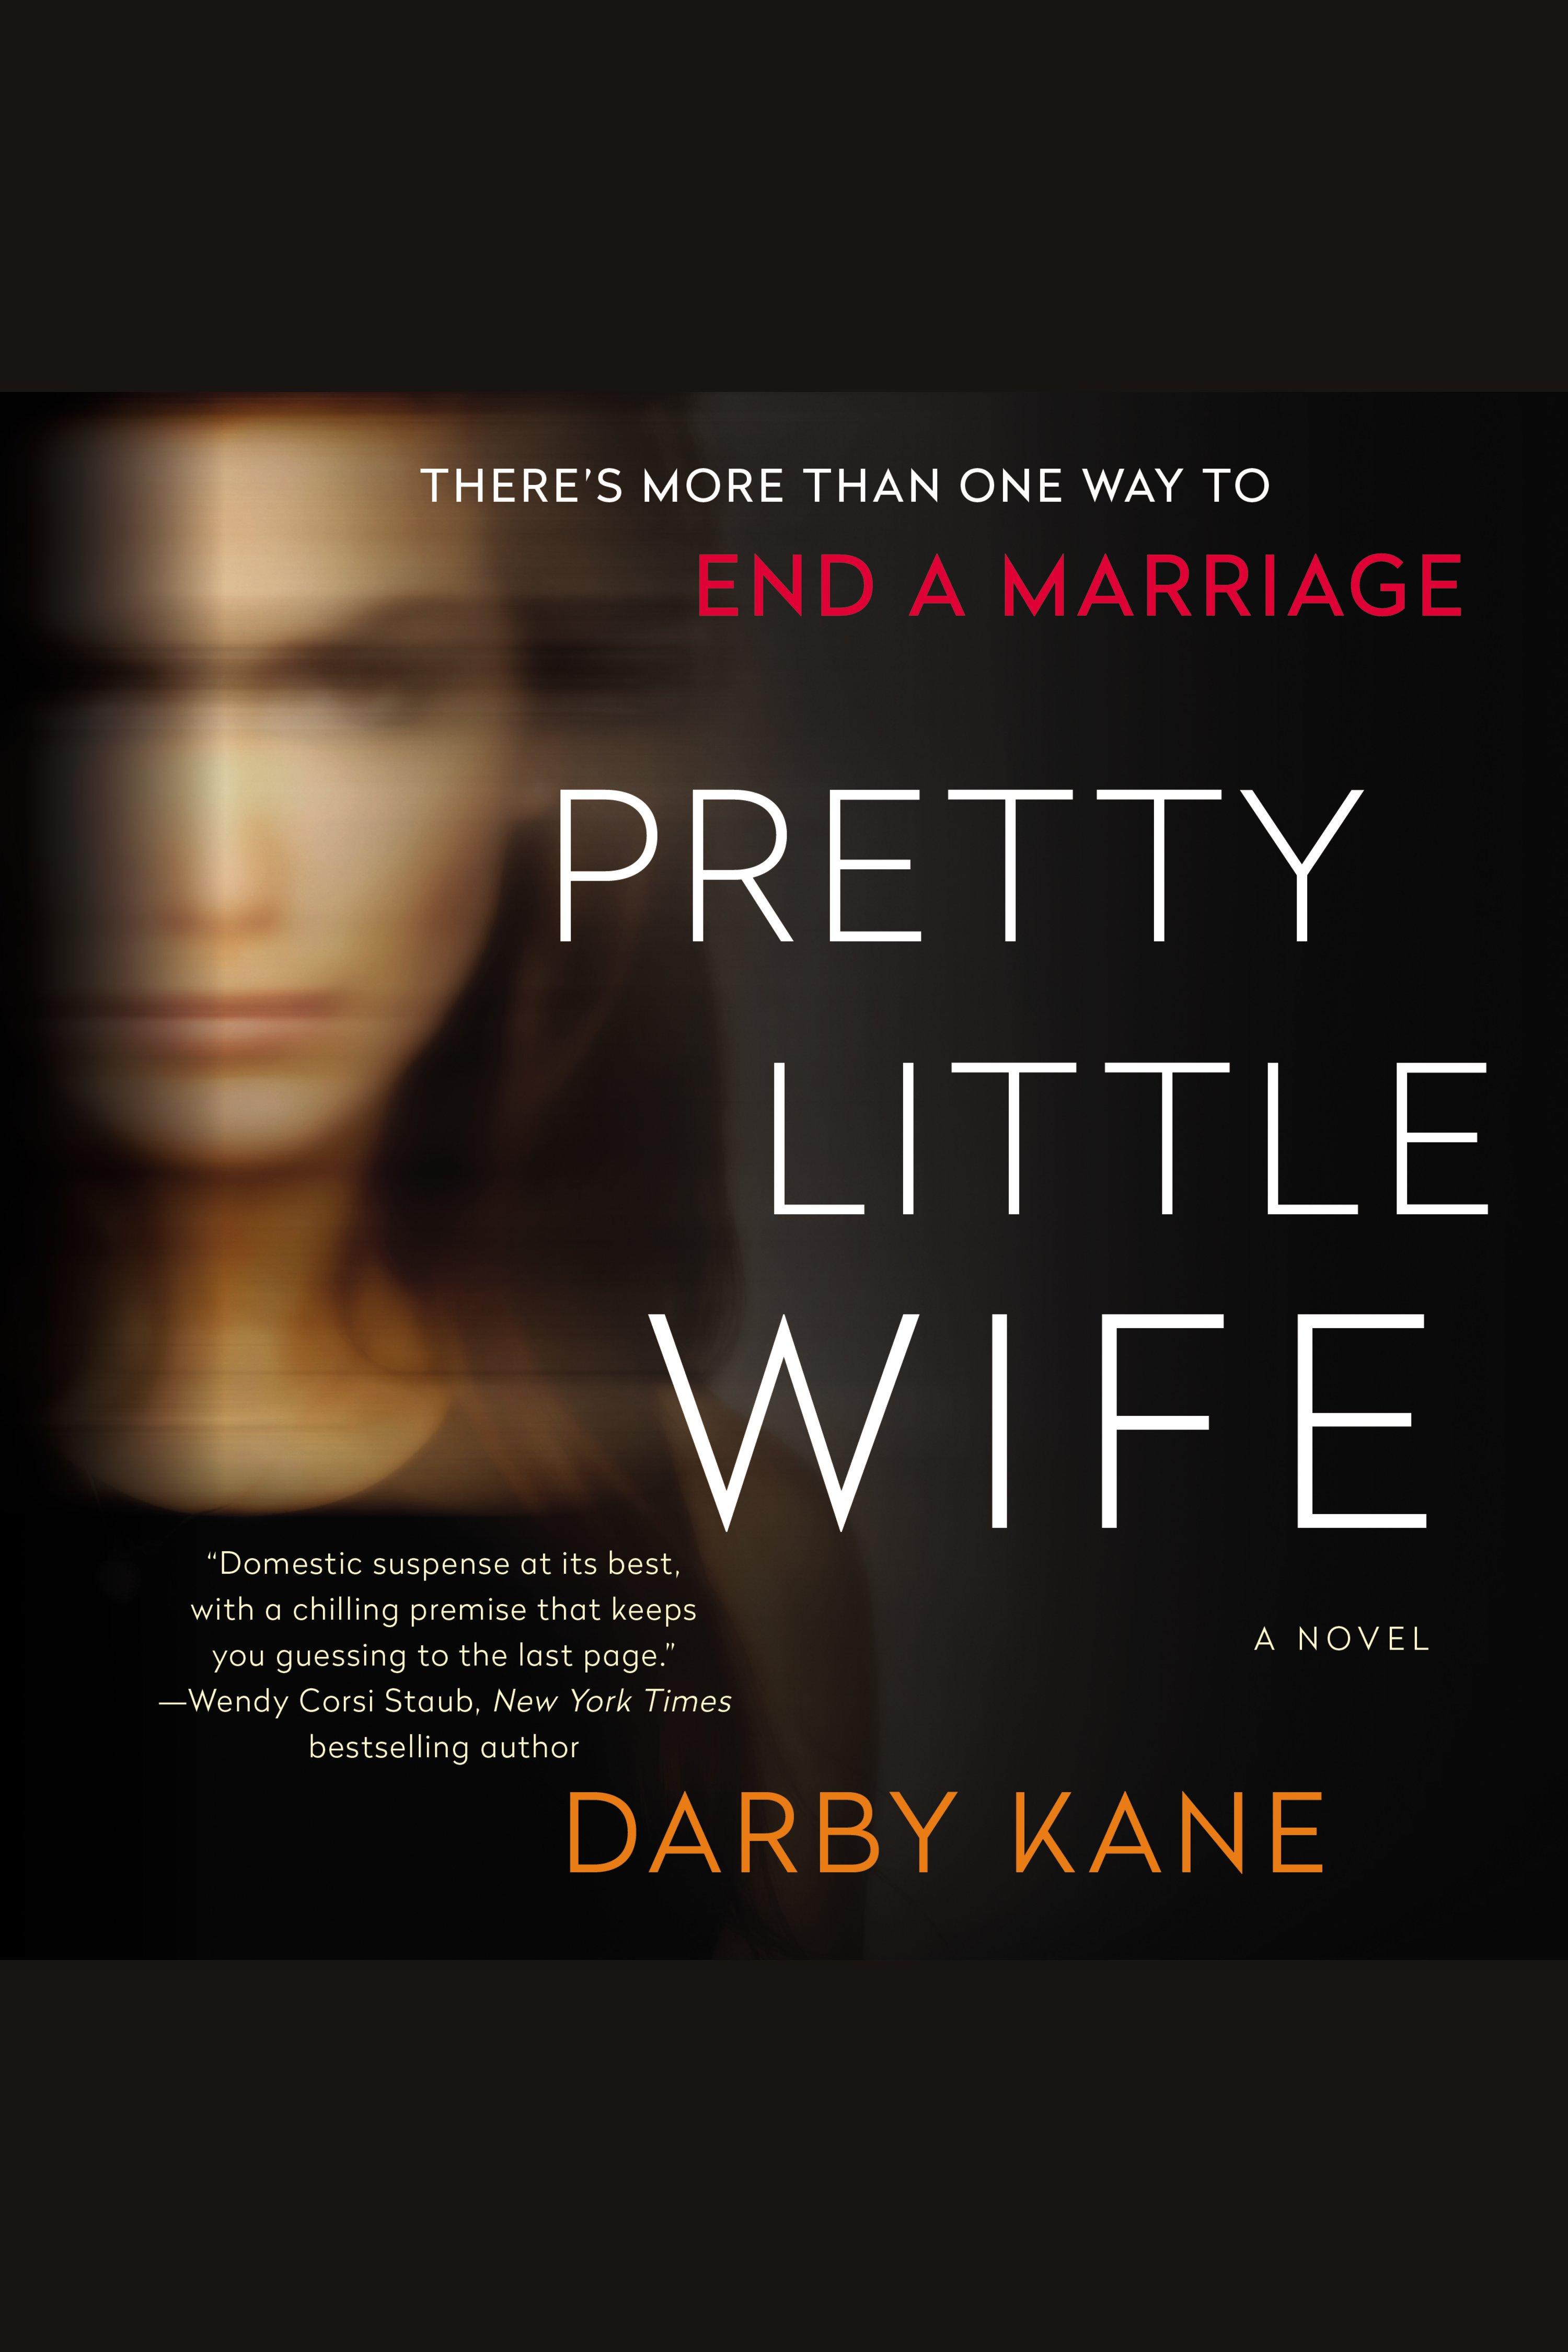 Pretty Little Wife A Novel